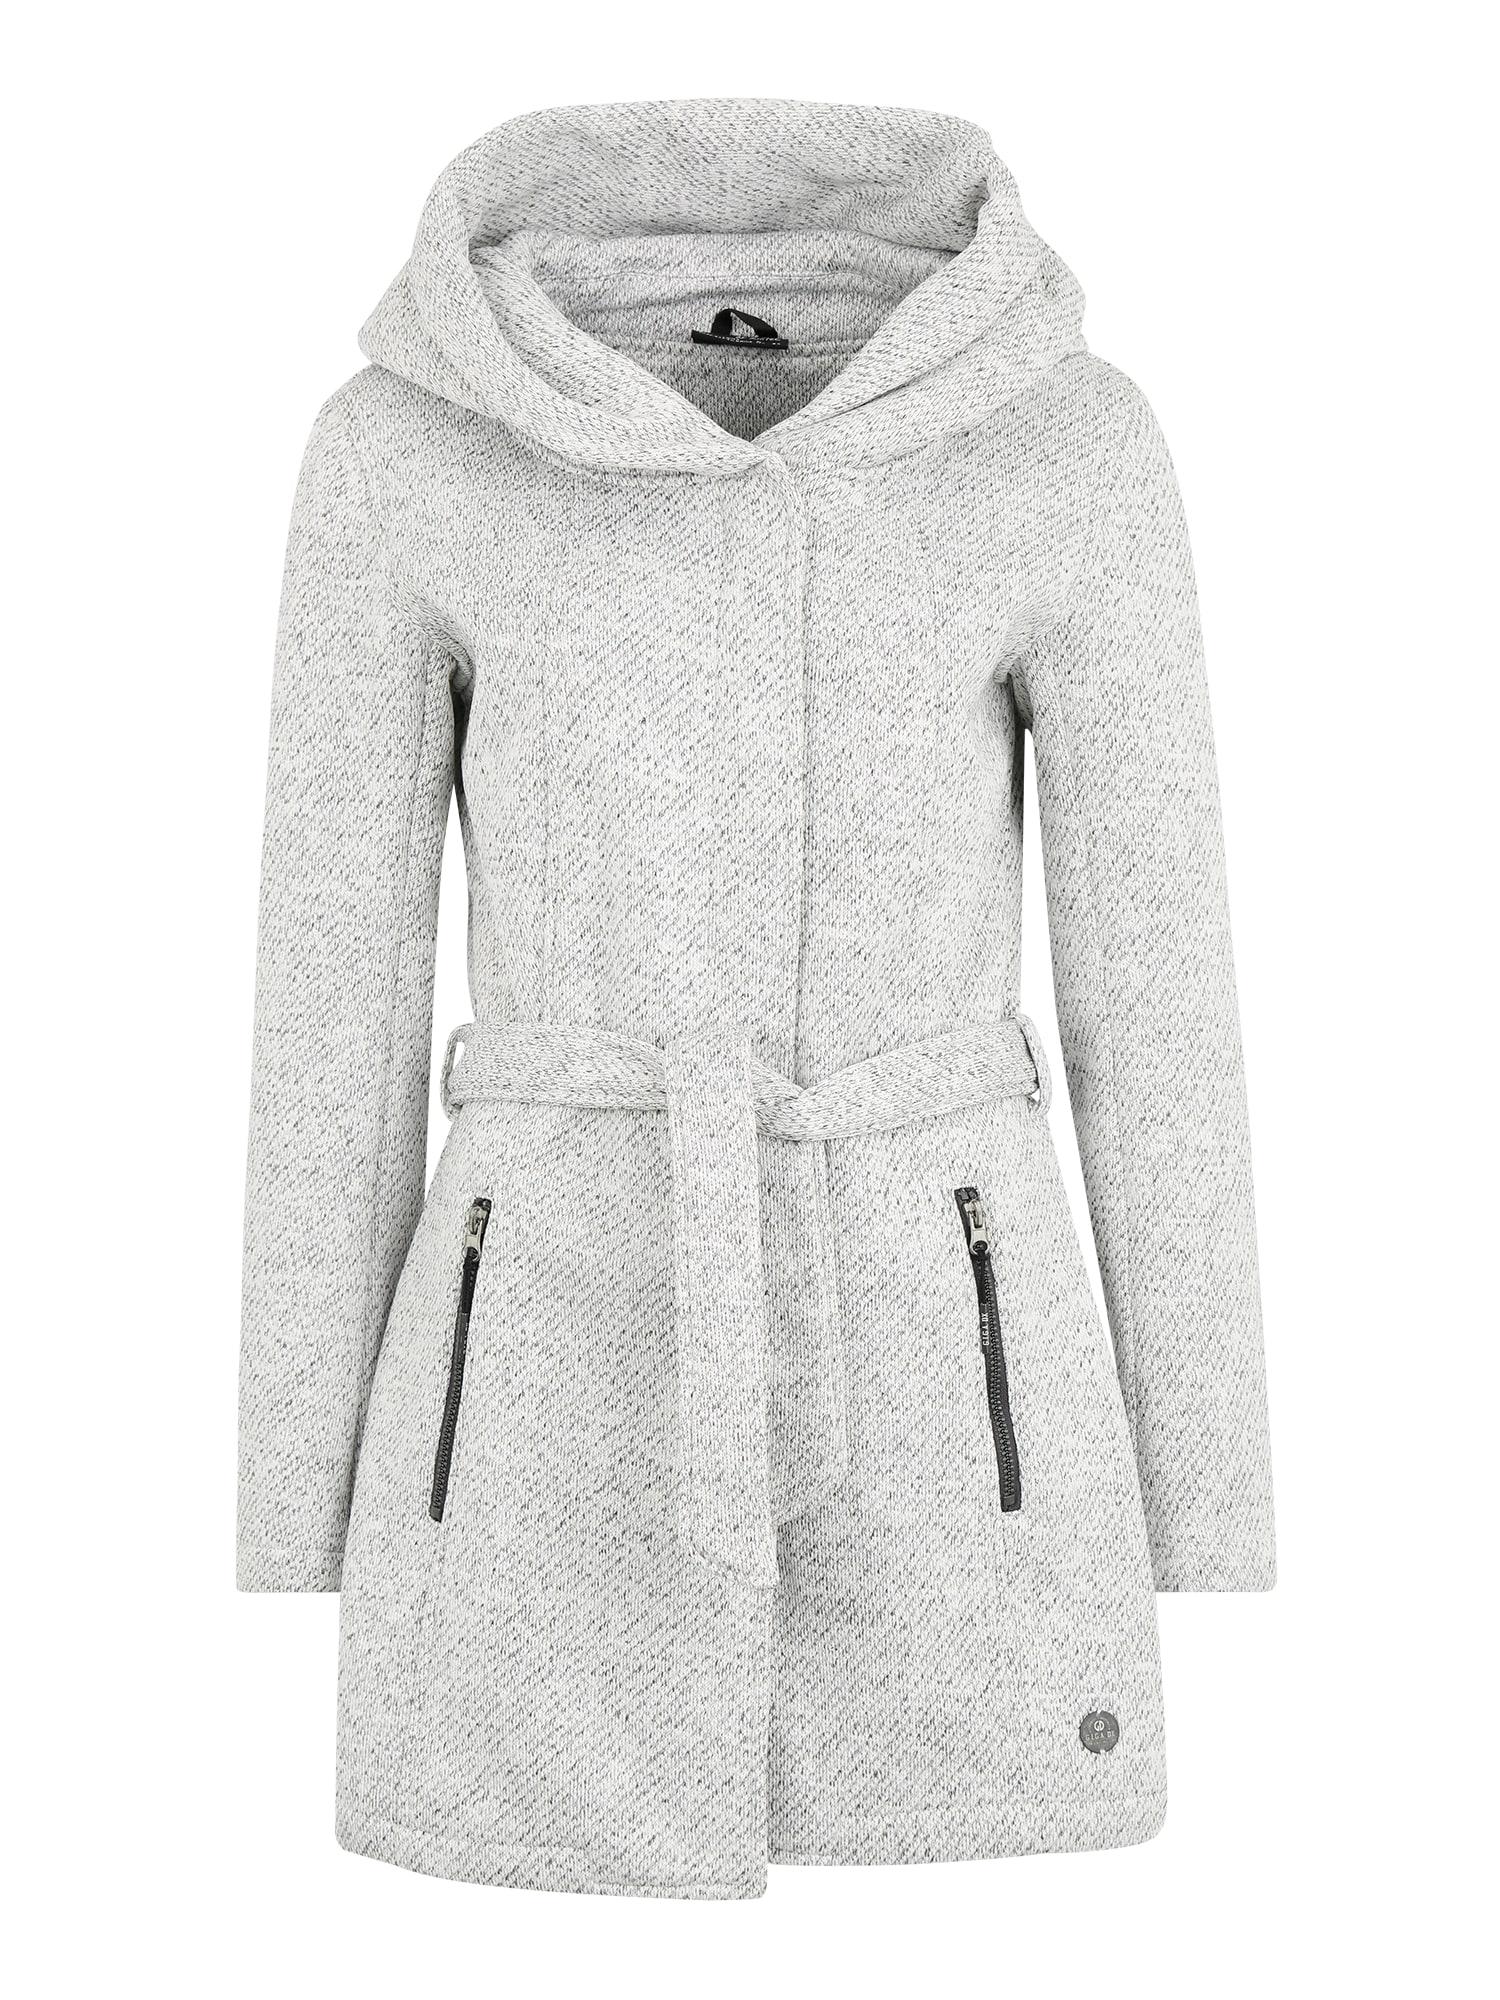 Přechodný kabát Frydara bílá G.I.G.A. DX